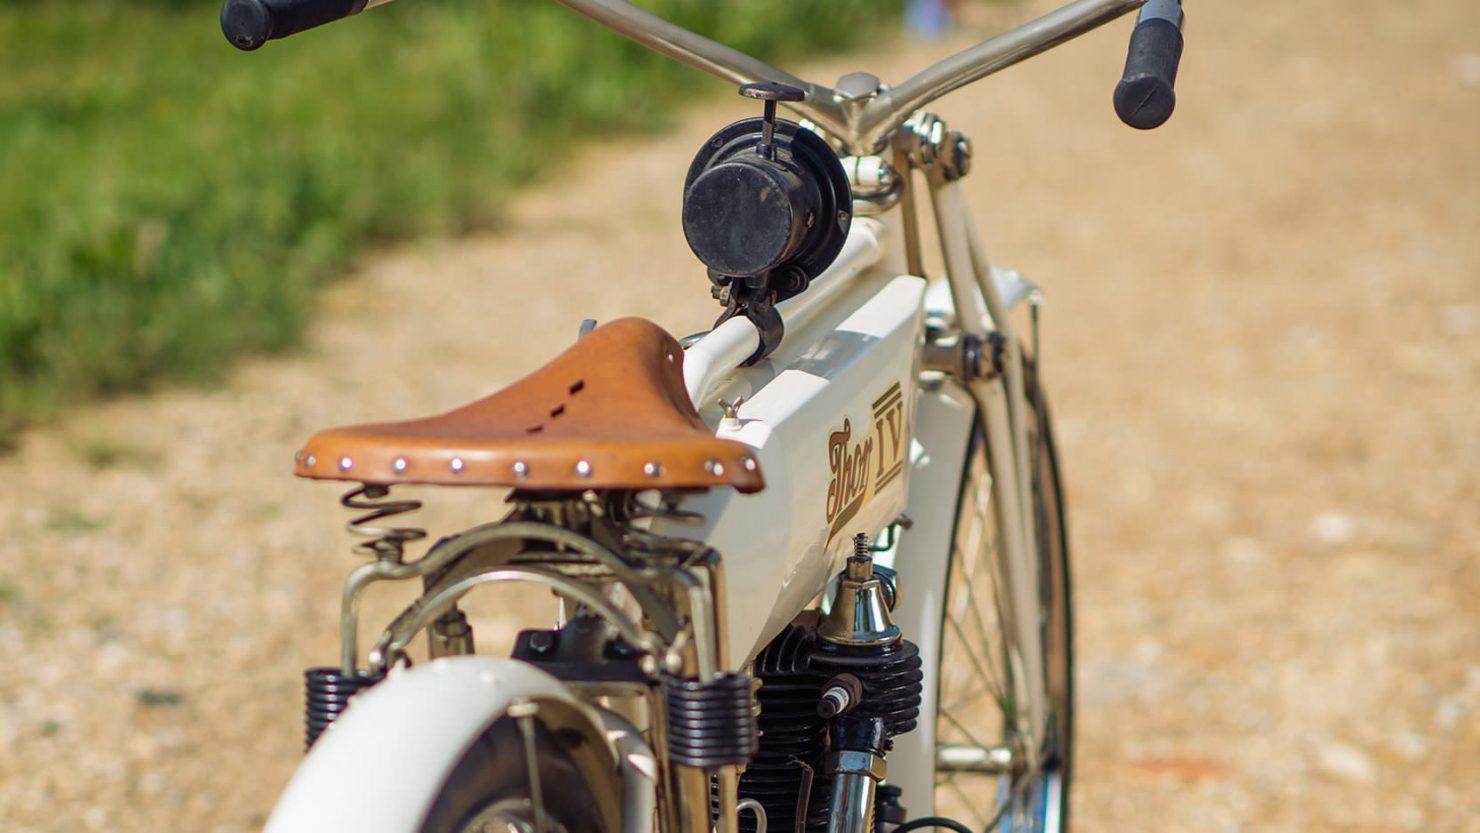 Thor Single Motorcycle 6 1480x833